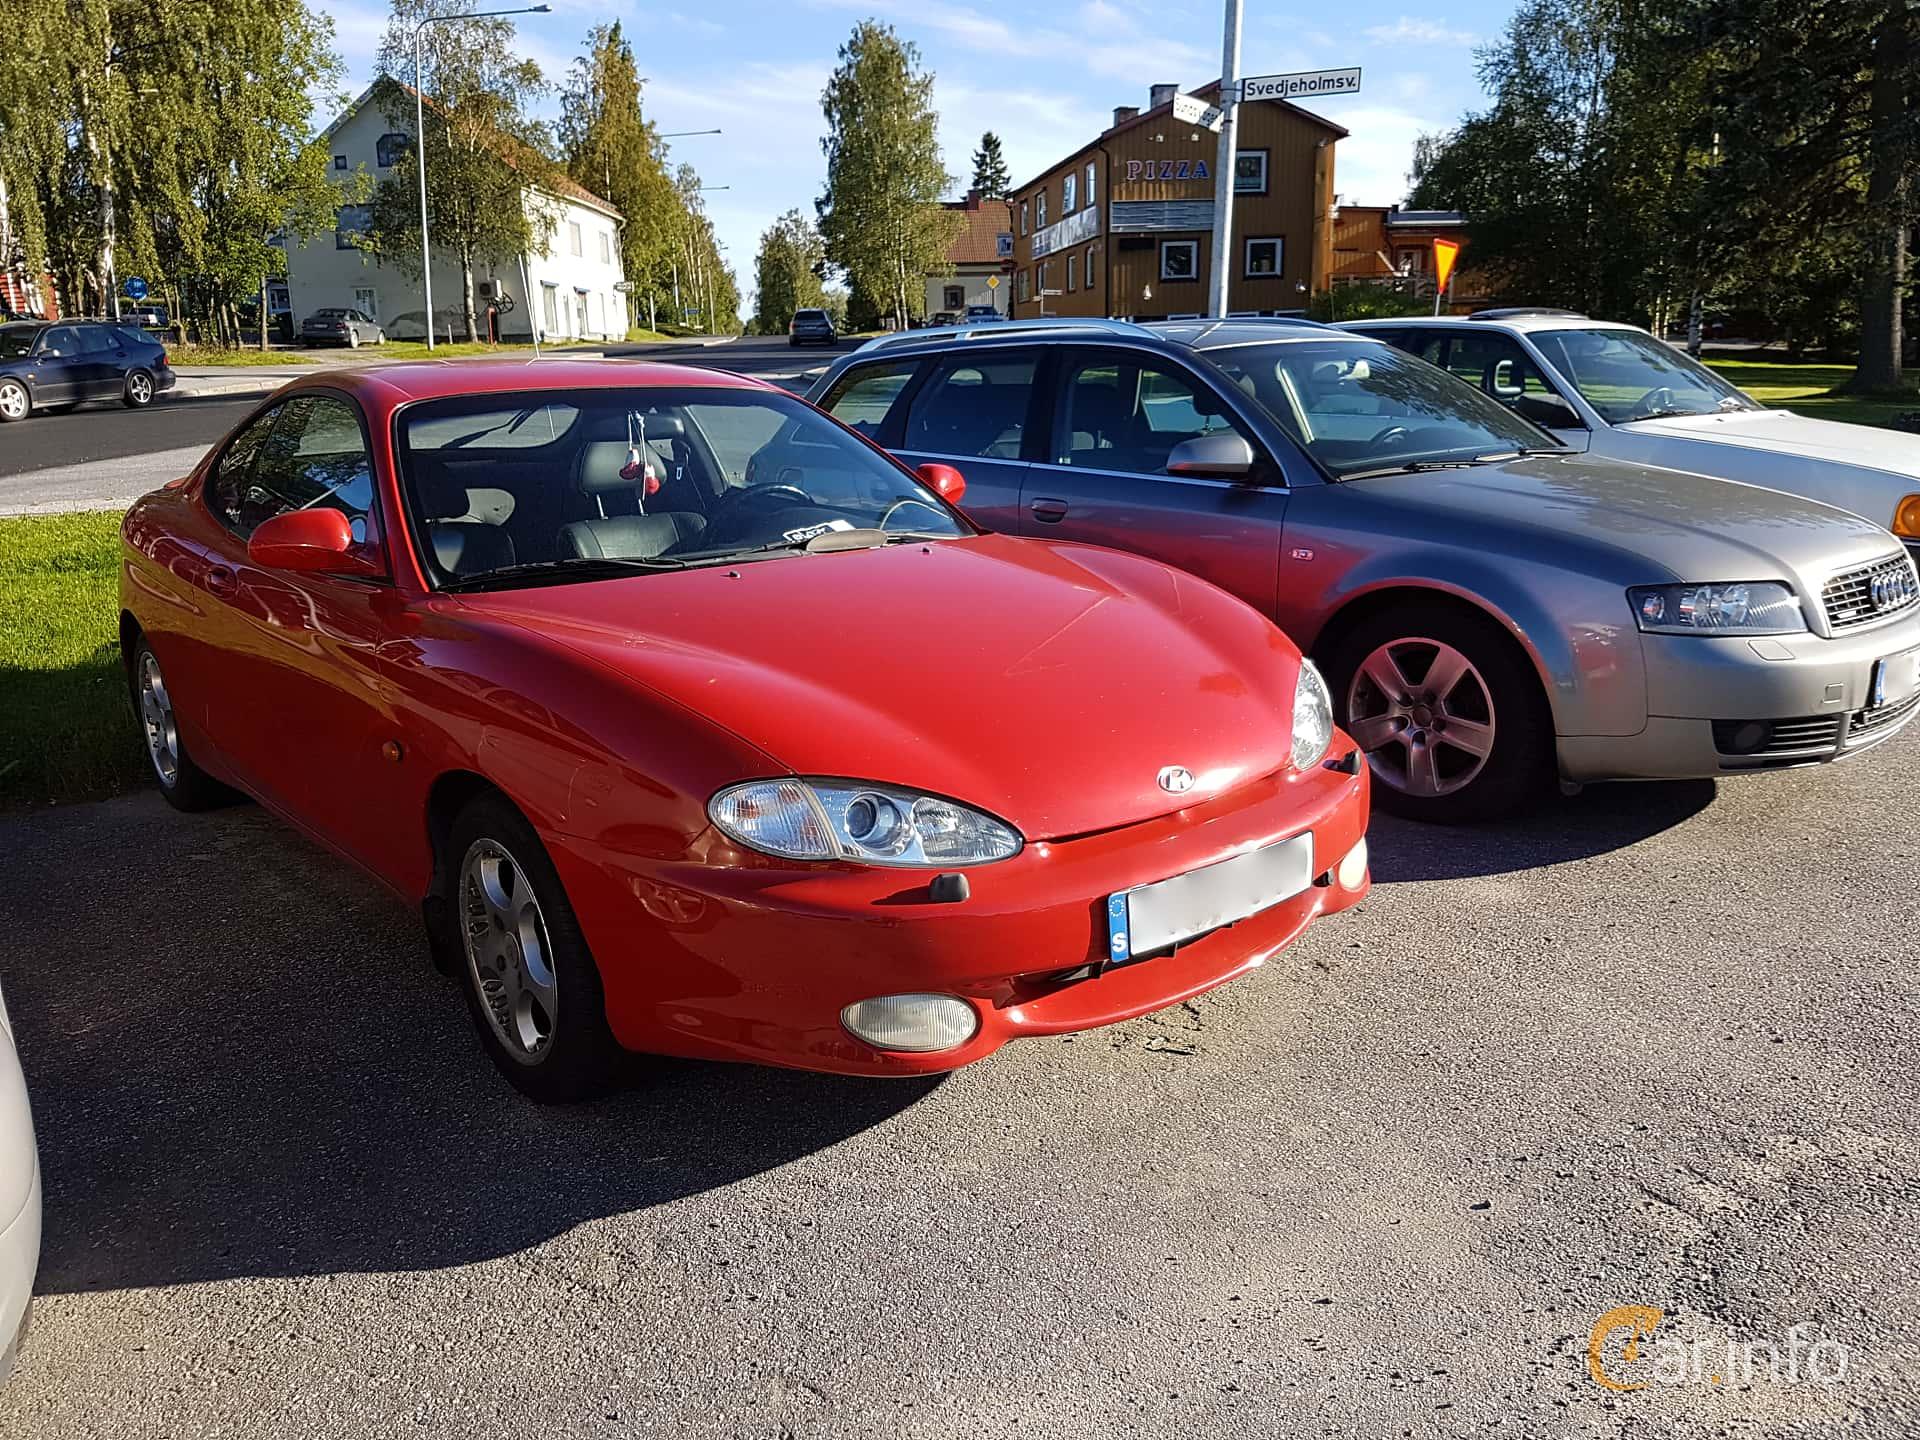 Hyundai Coupé 2.0 Automatic, 139hp, 1997